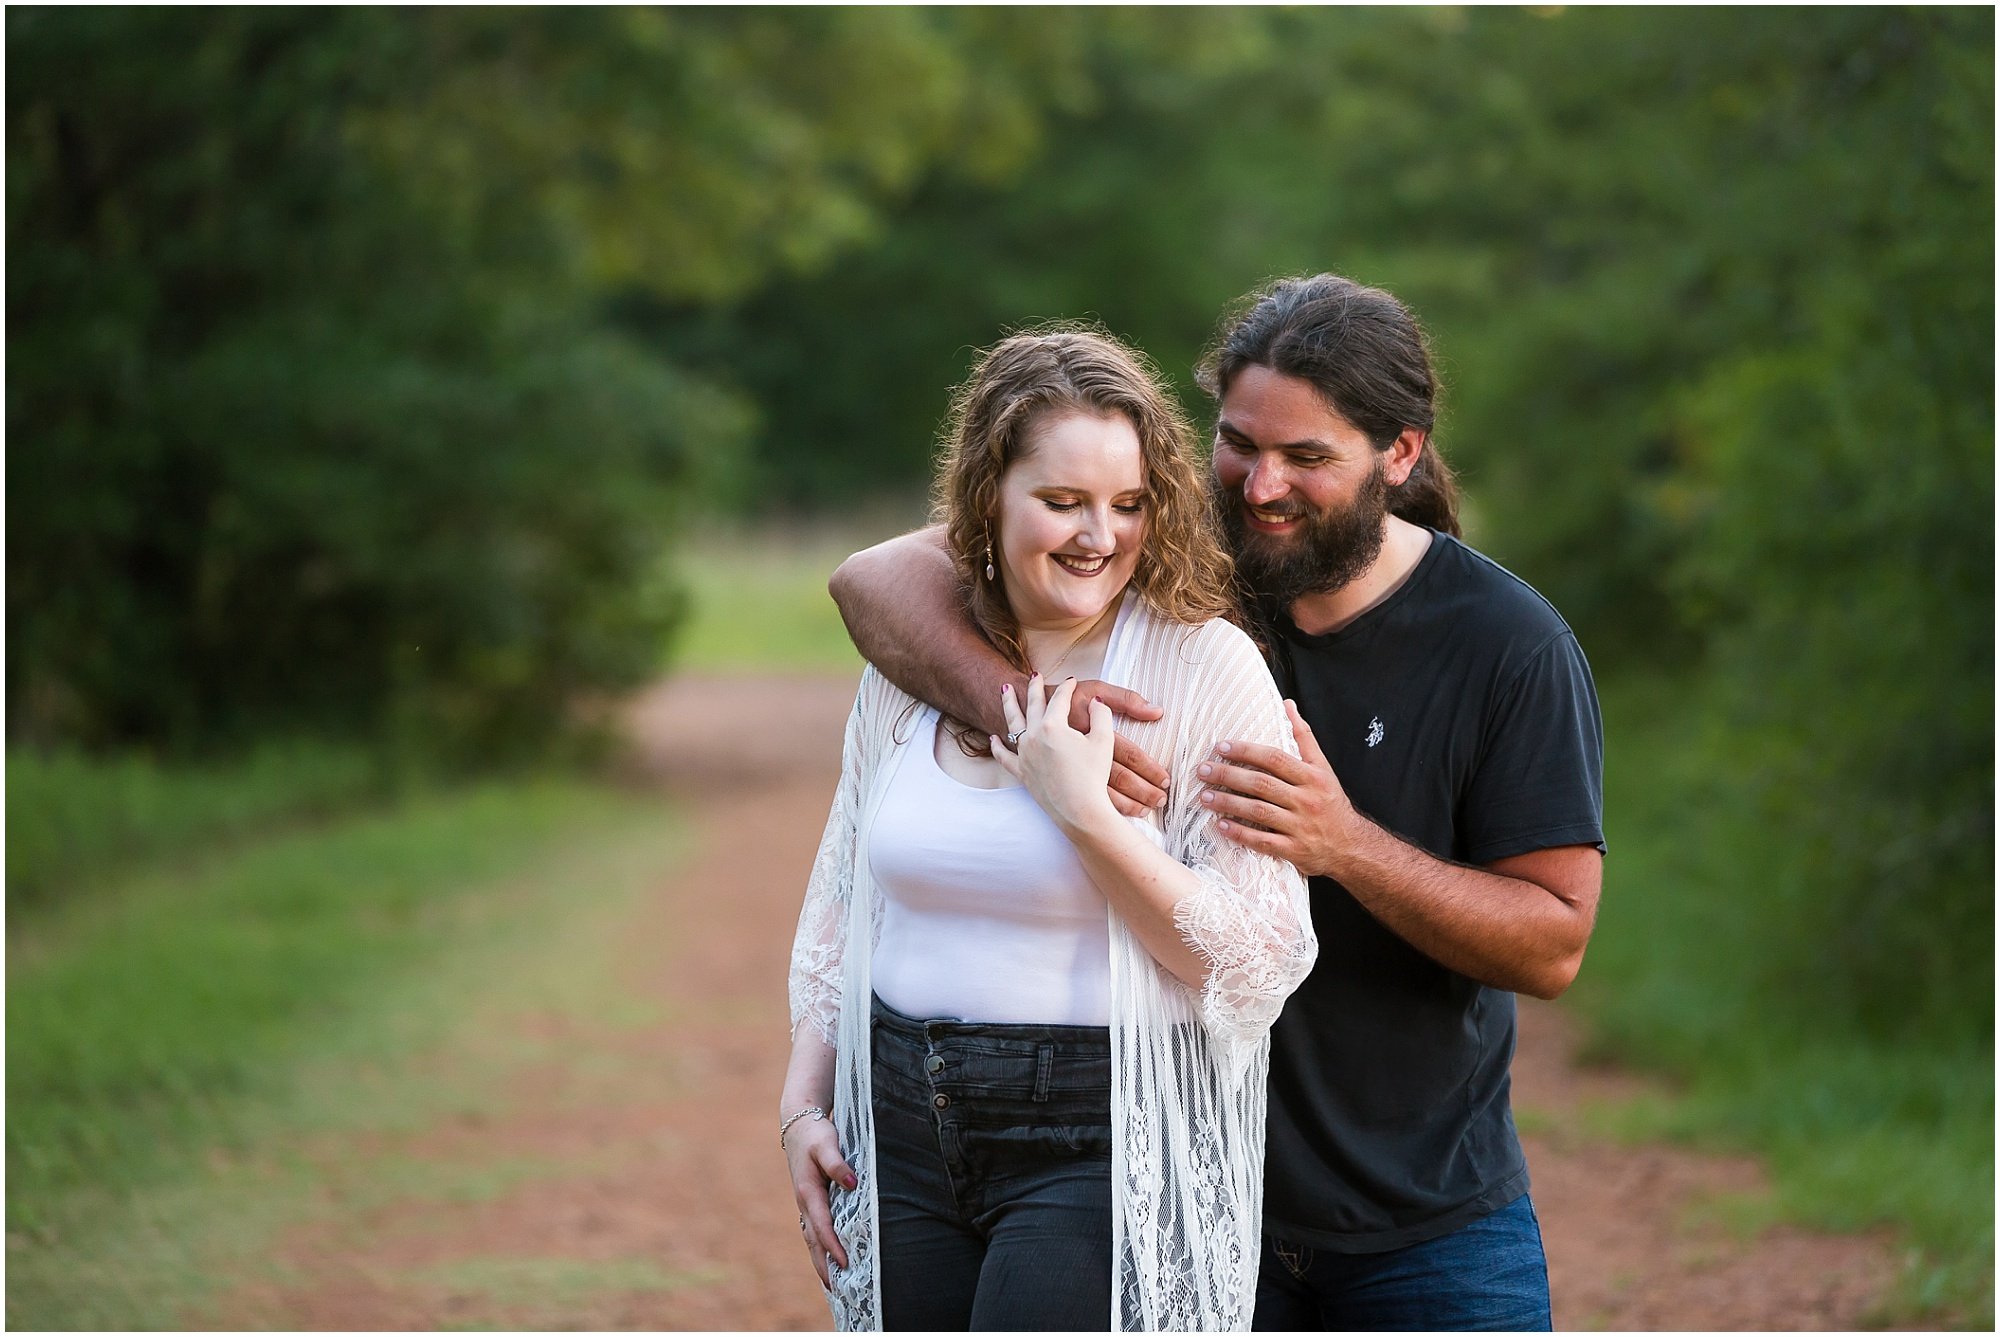 A man hugs his fiance during their engagement session at Lick Creek Park in College Station, Tx - Jason & Melaina Photography - www.jasonandmelaina.com